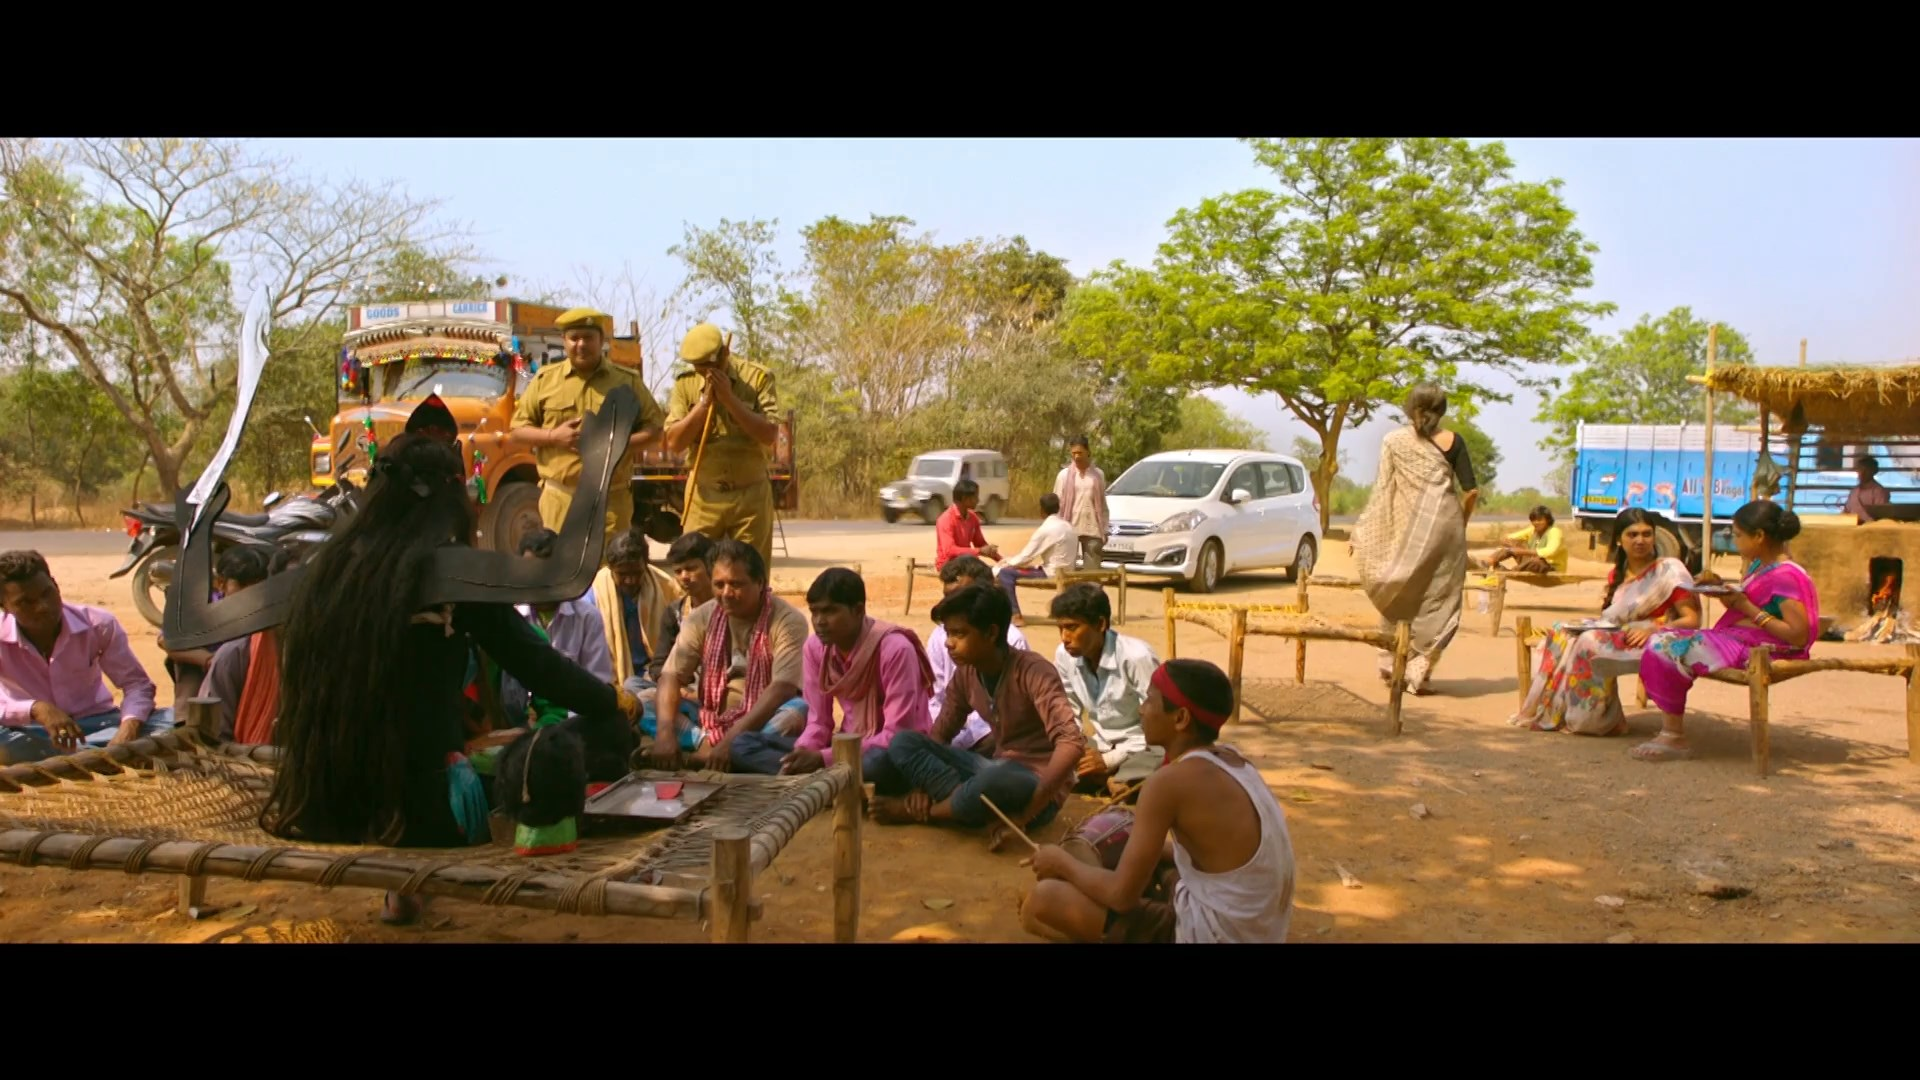 Uronchondi.2018.Bengali.1080p.WEB.DL.AVC.AAC.DUS.ICTV.mkv snapshot 00.36.14.000